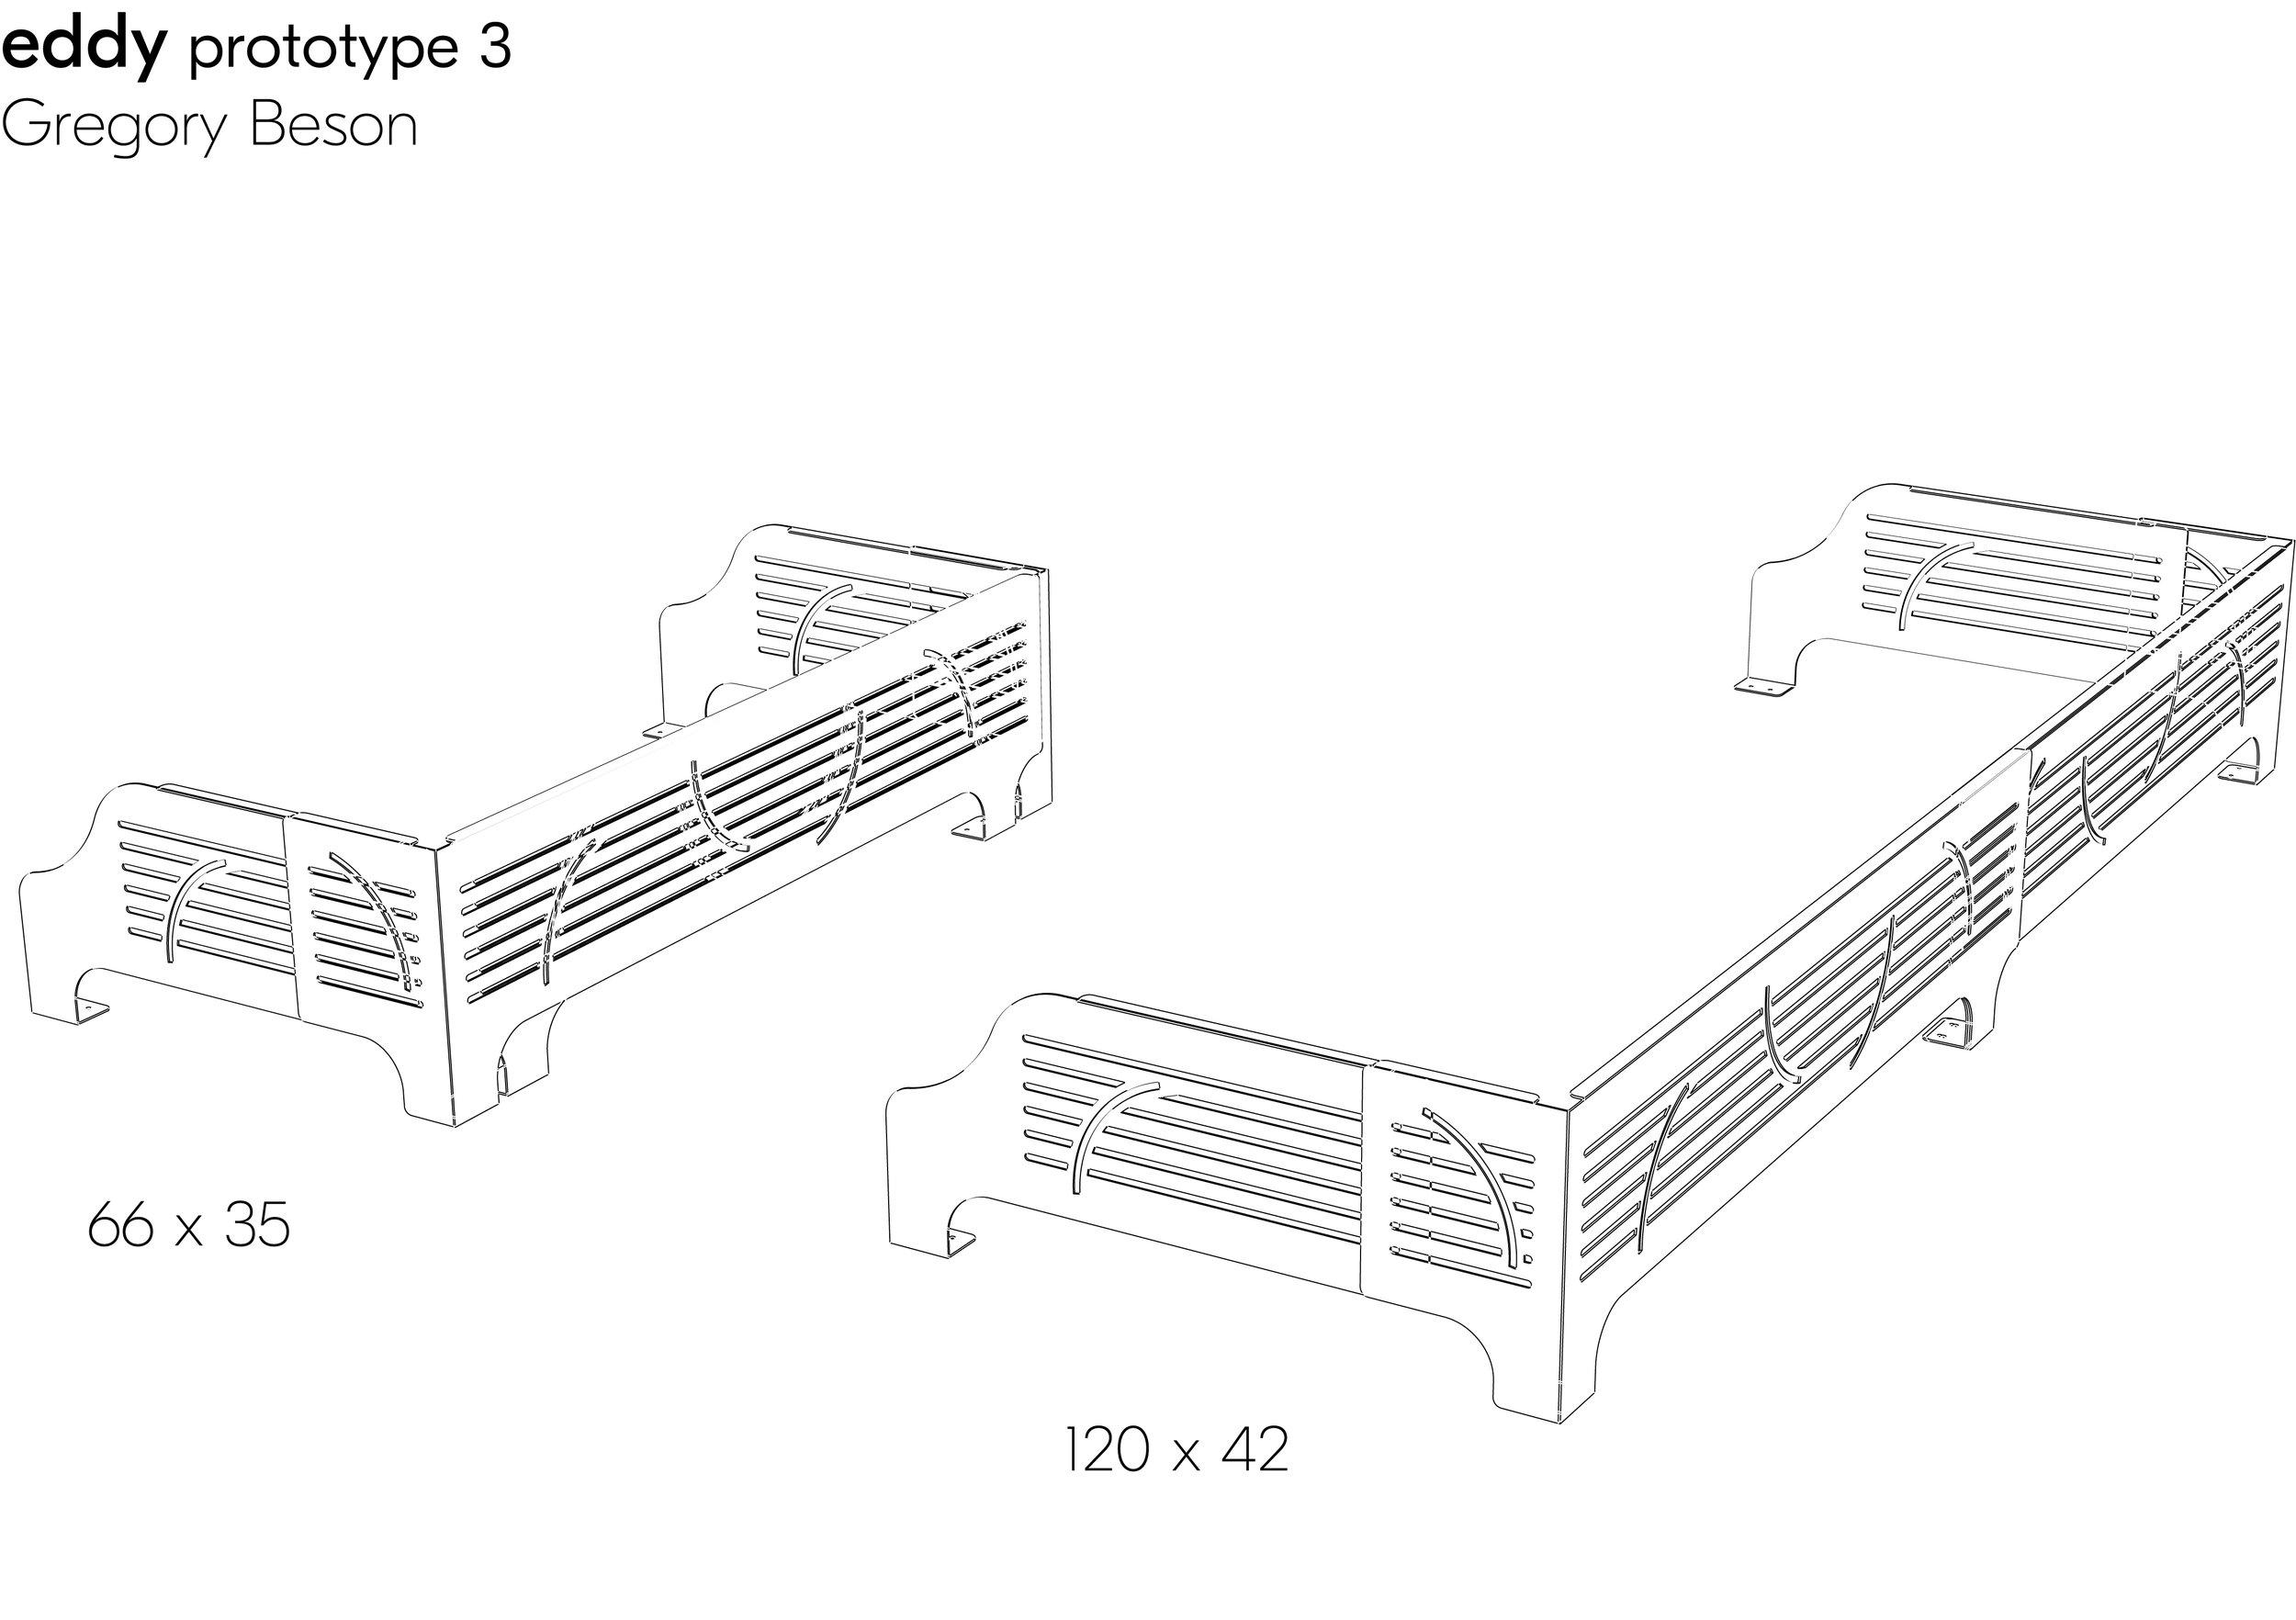 eddy_2 sizes [Converted].jpg